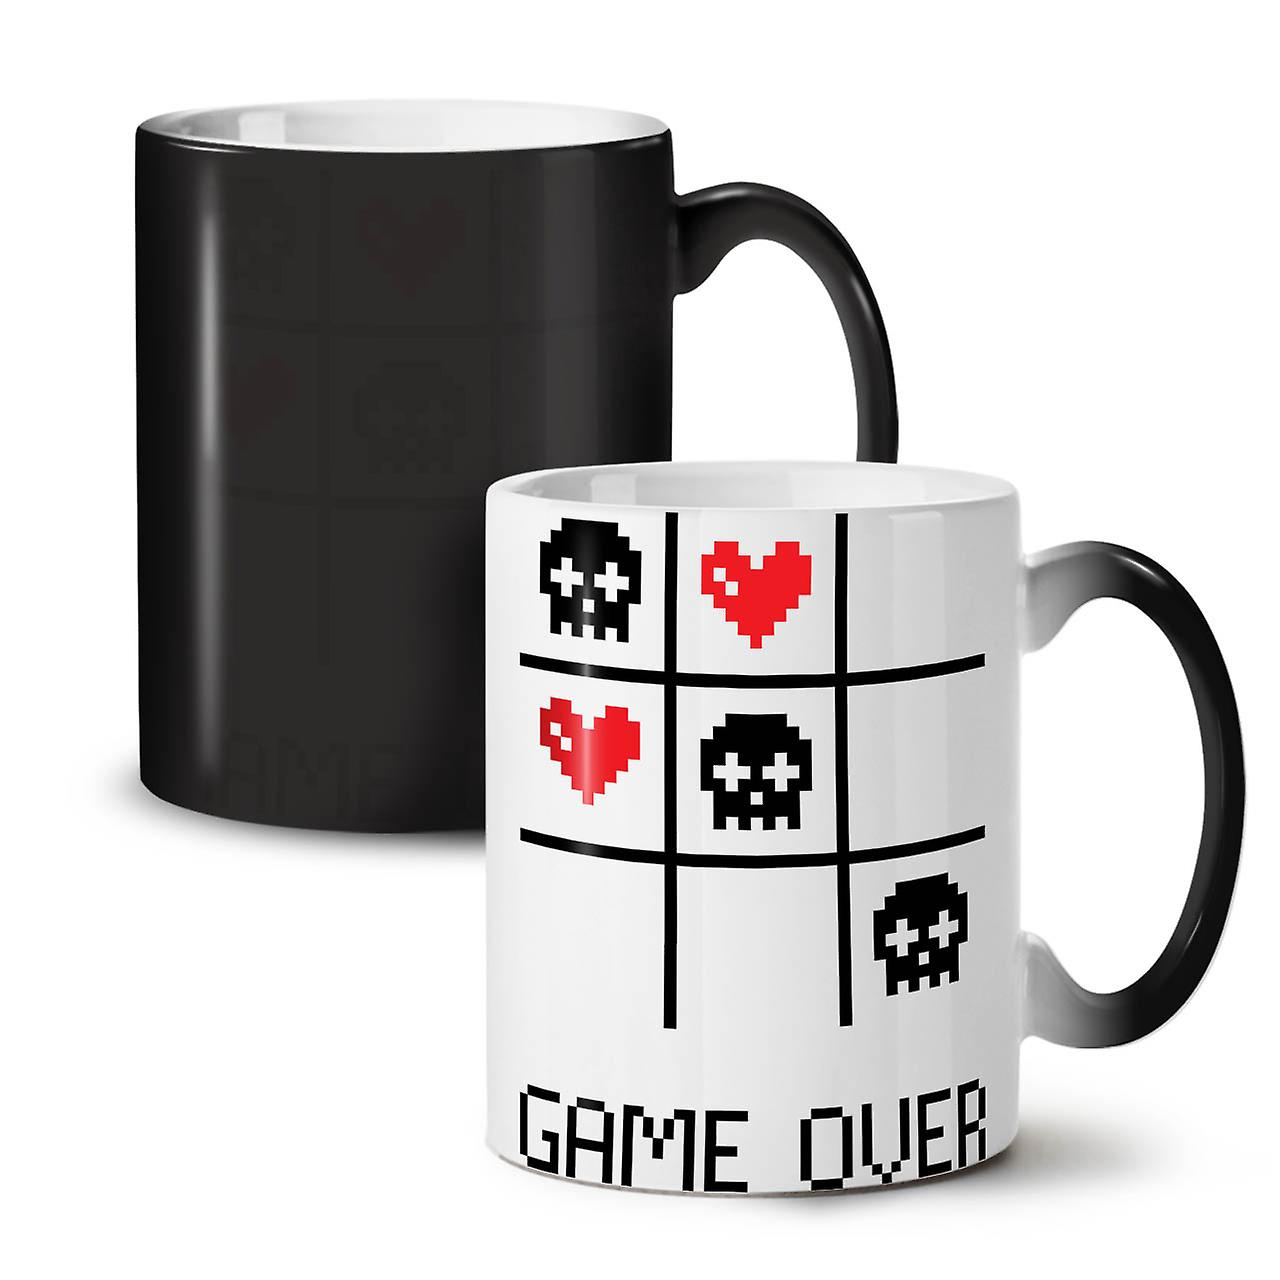 Colour Geek OzWellcoda 11 Tea Mug Computer Changing Black Game Coffee New Ceramic vN80nmw